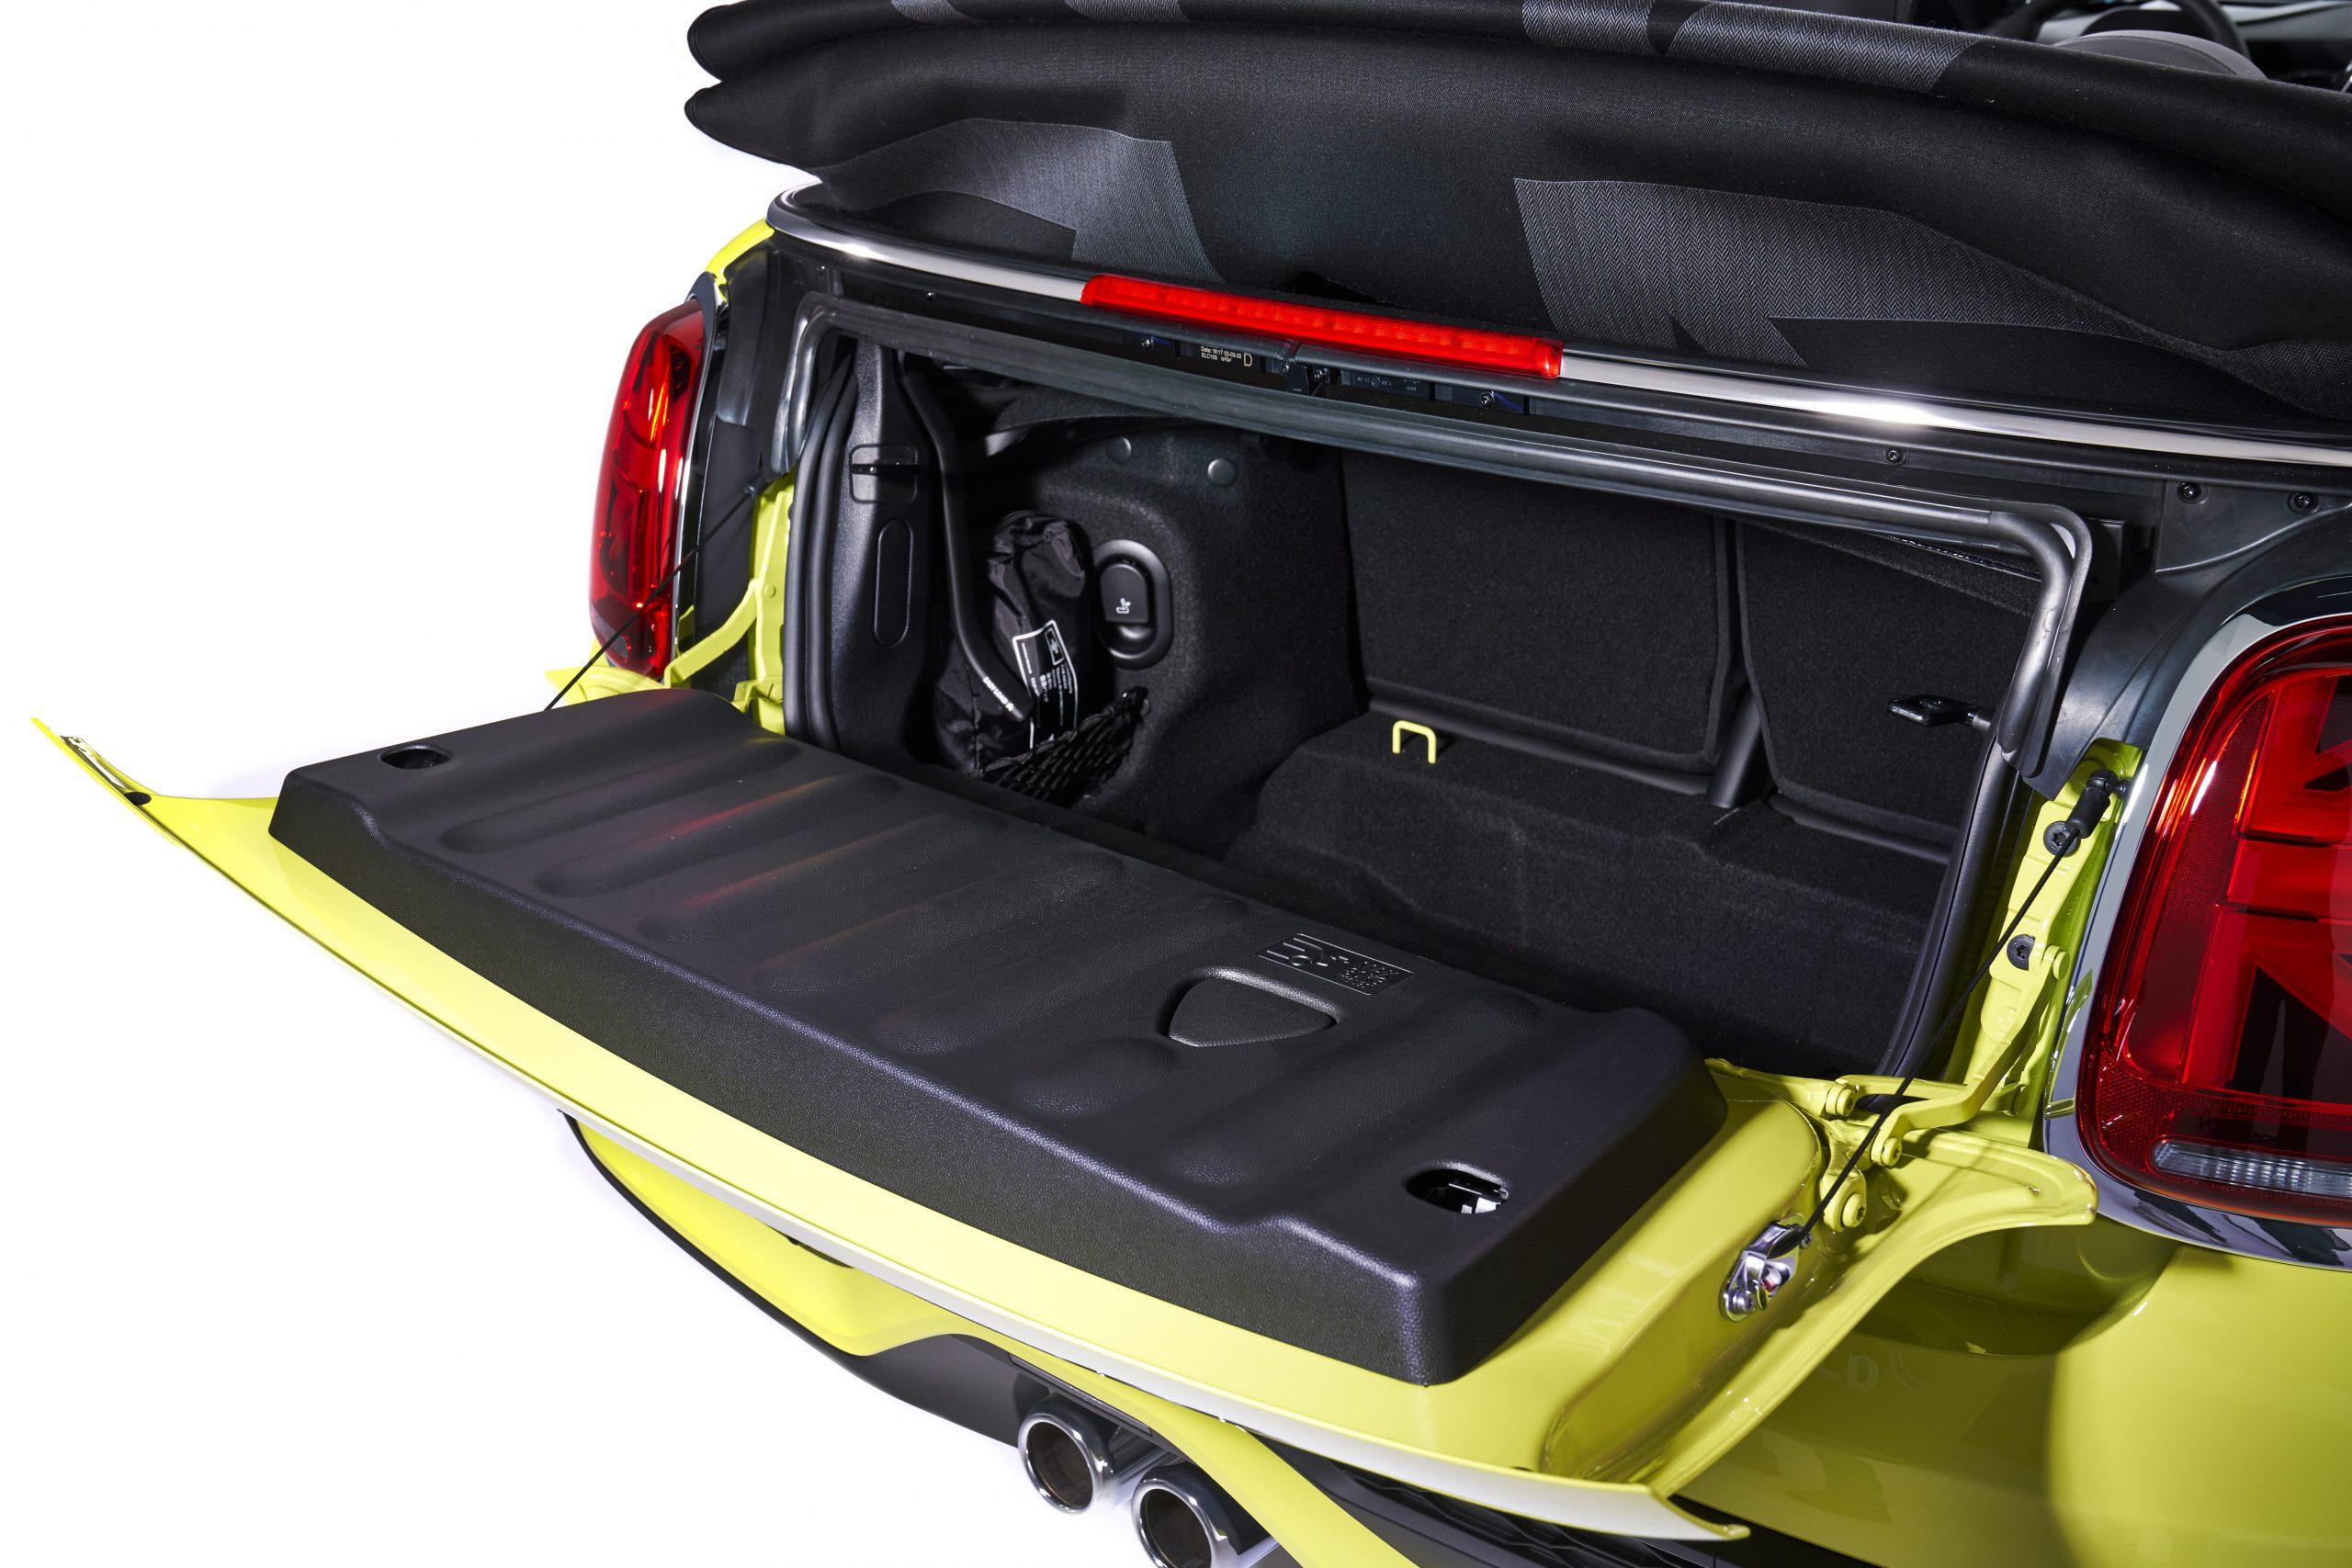 2022 Mini Cooper convertible trunk